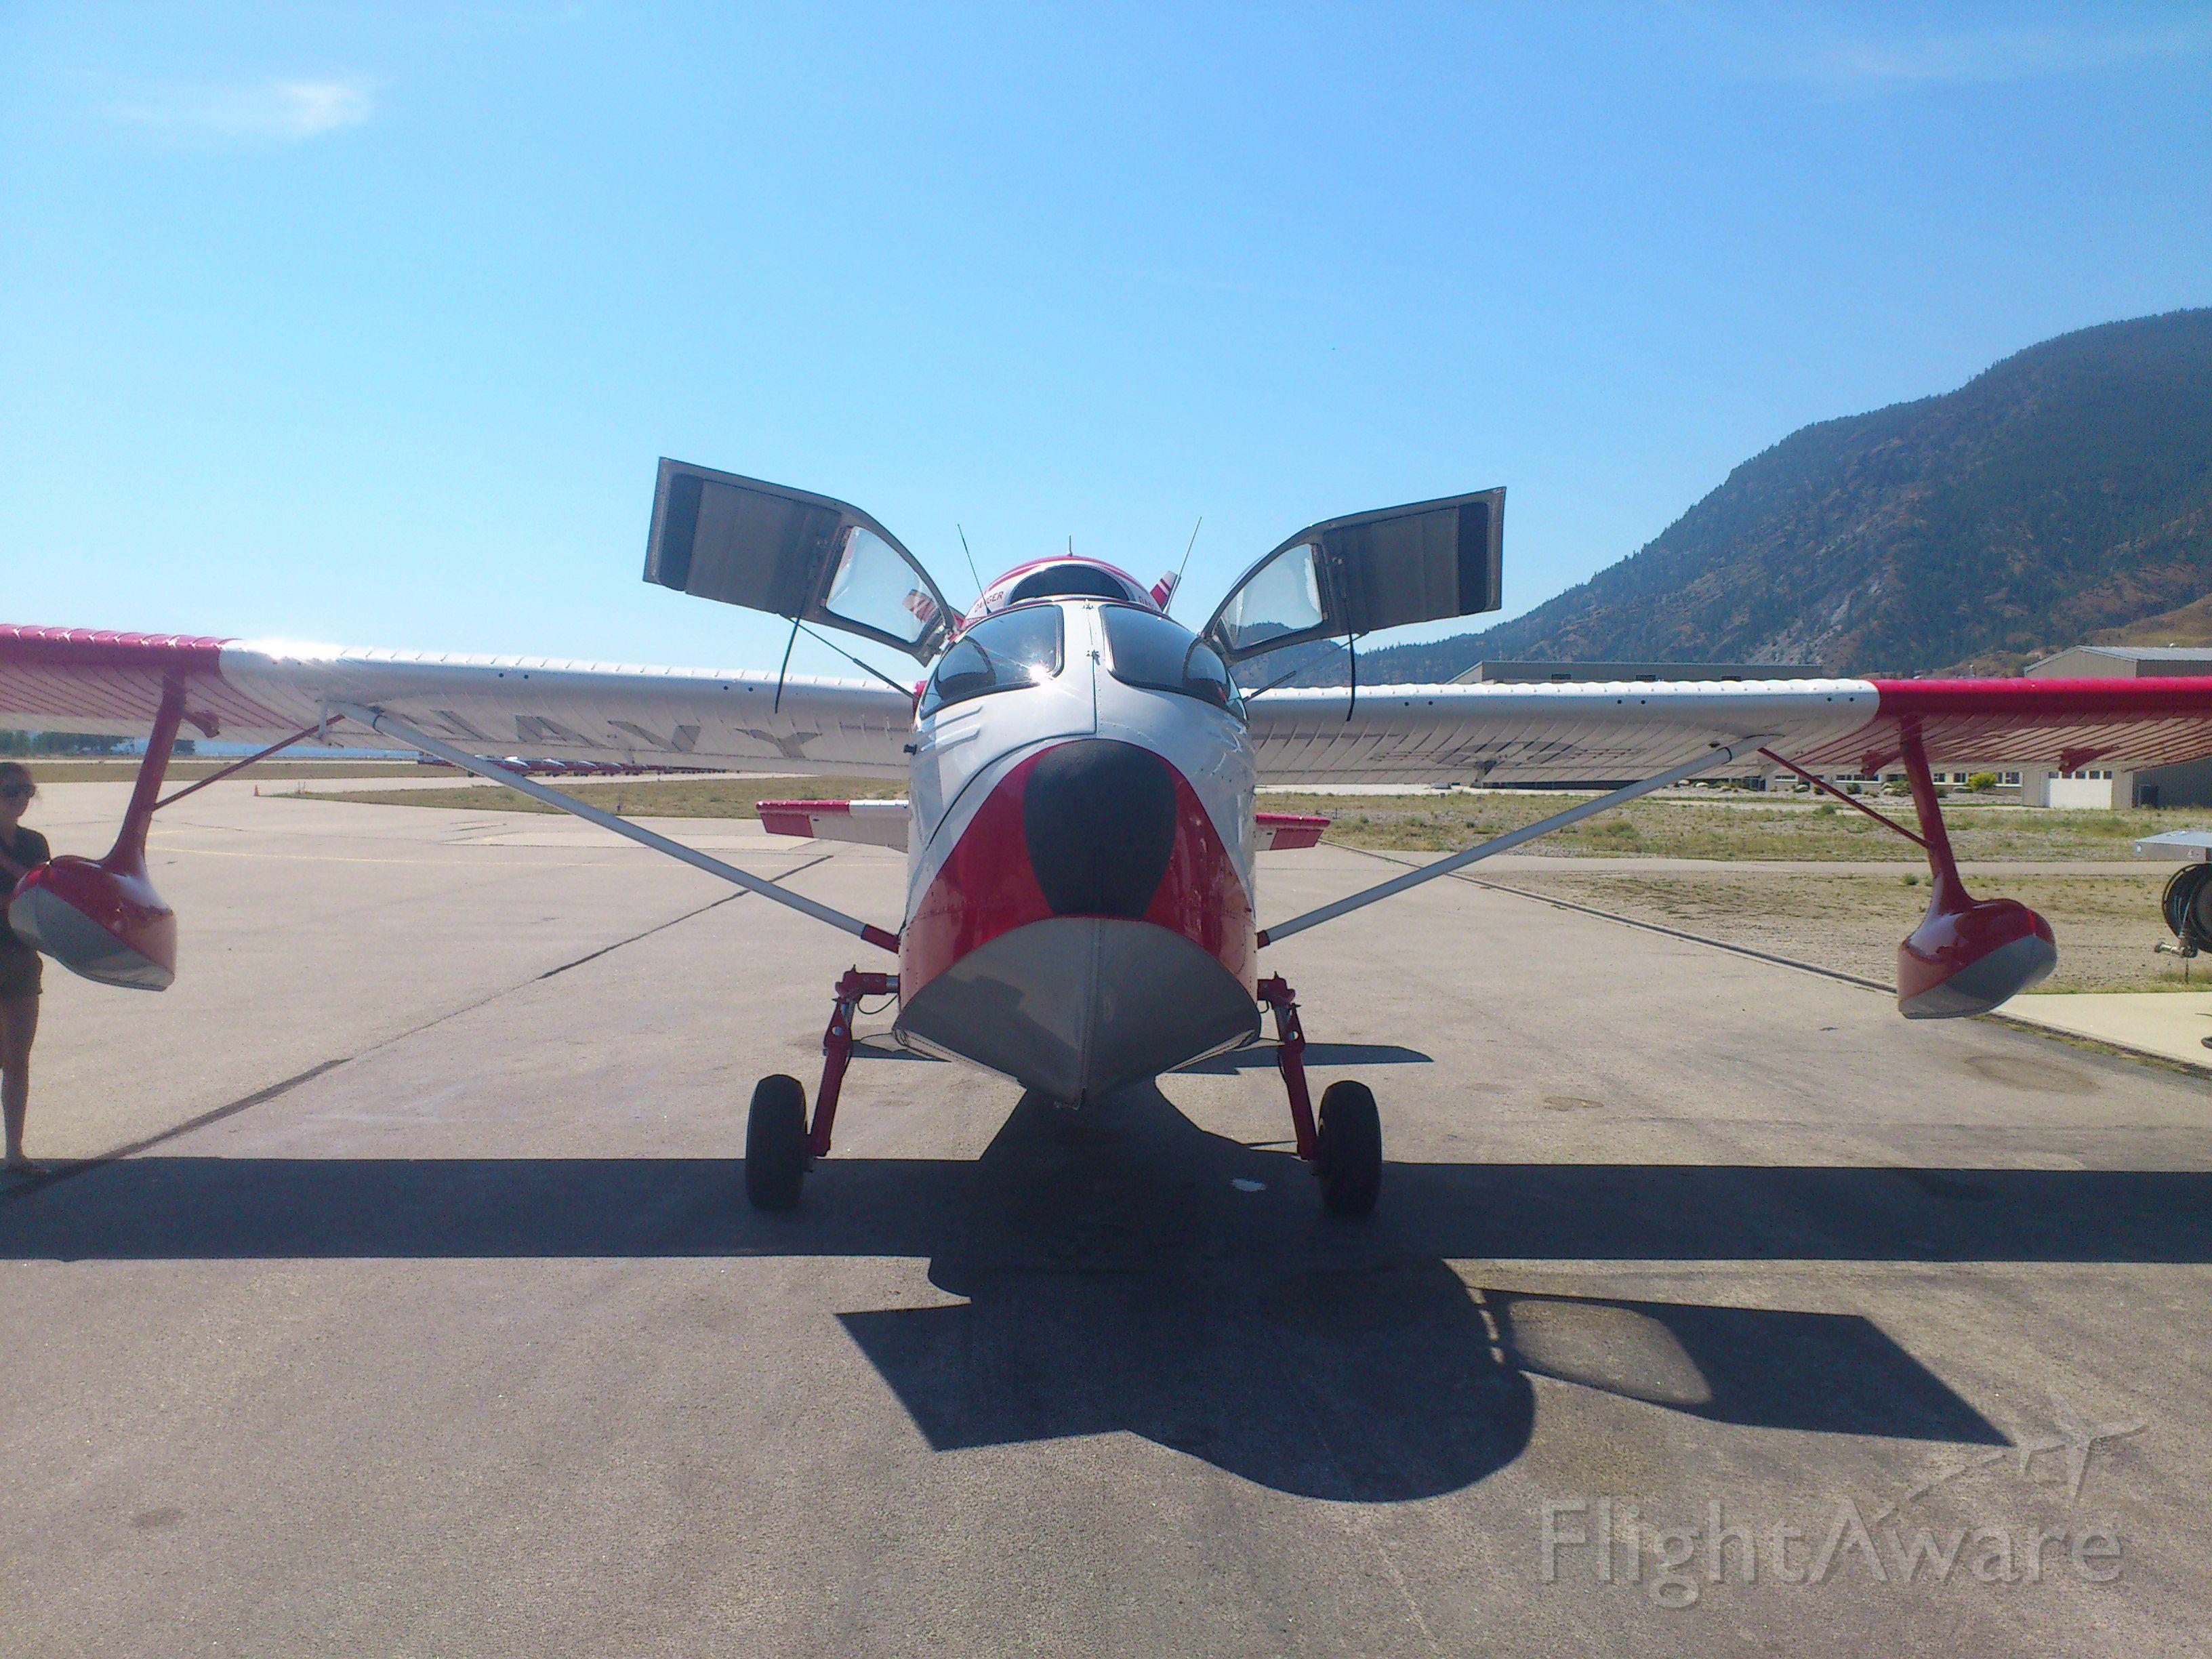 N64PN — - Penticton Airport, Canada CYYF Aug 2013. Republic R-34 Seabee